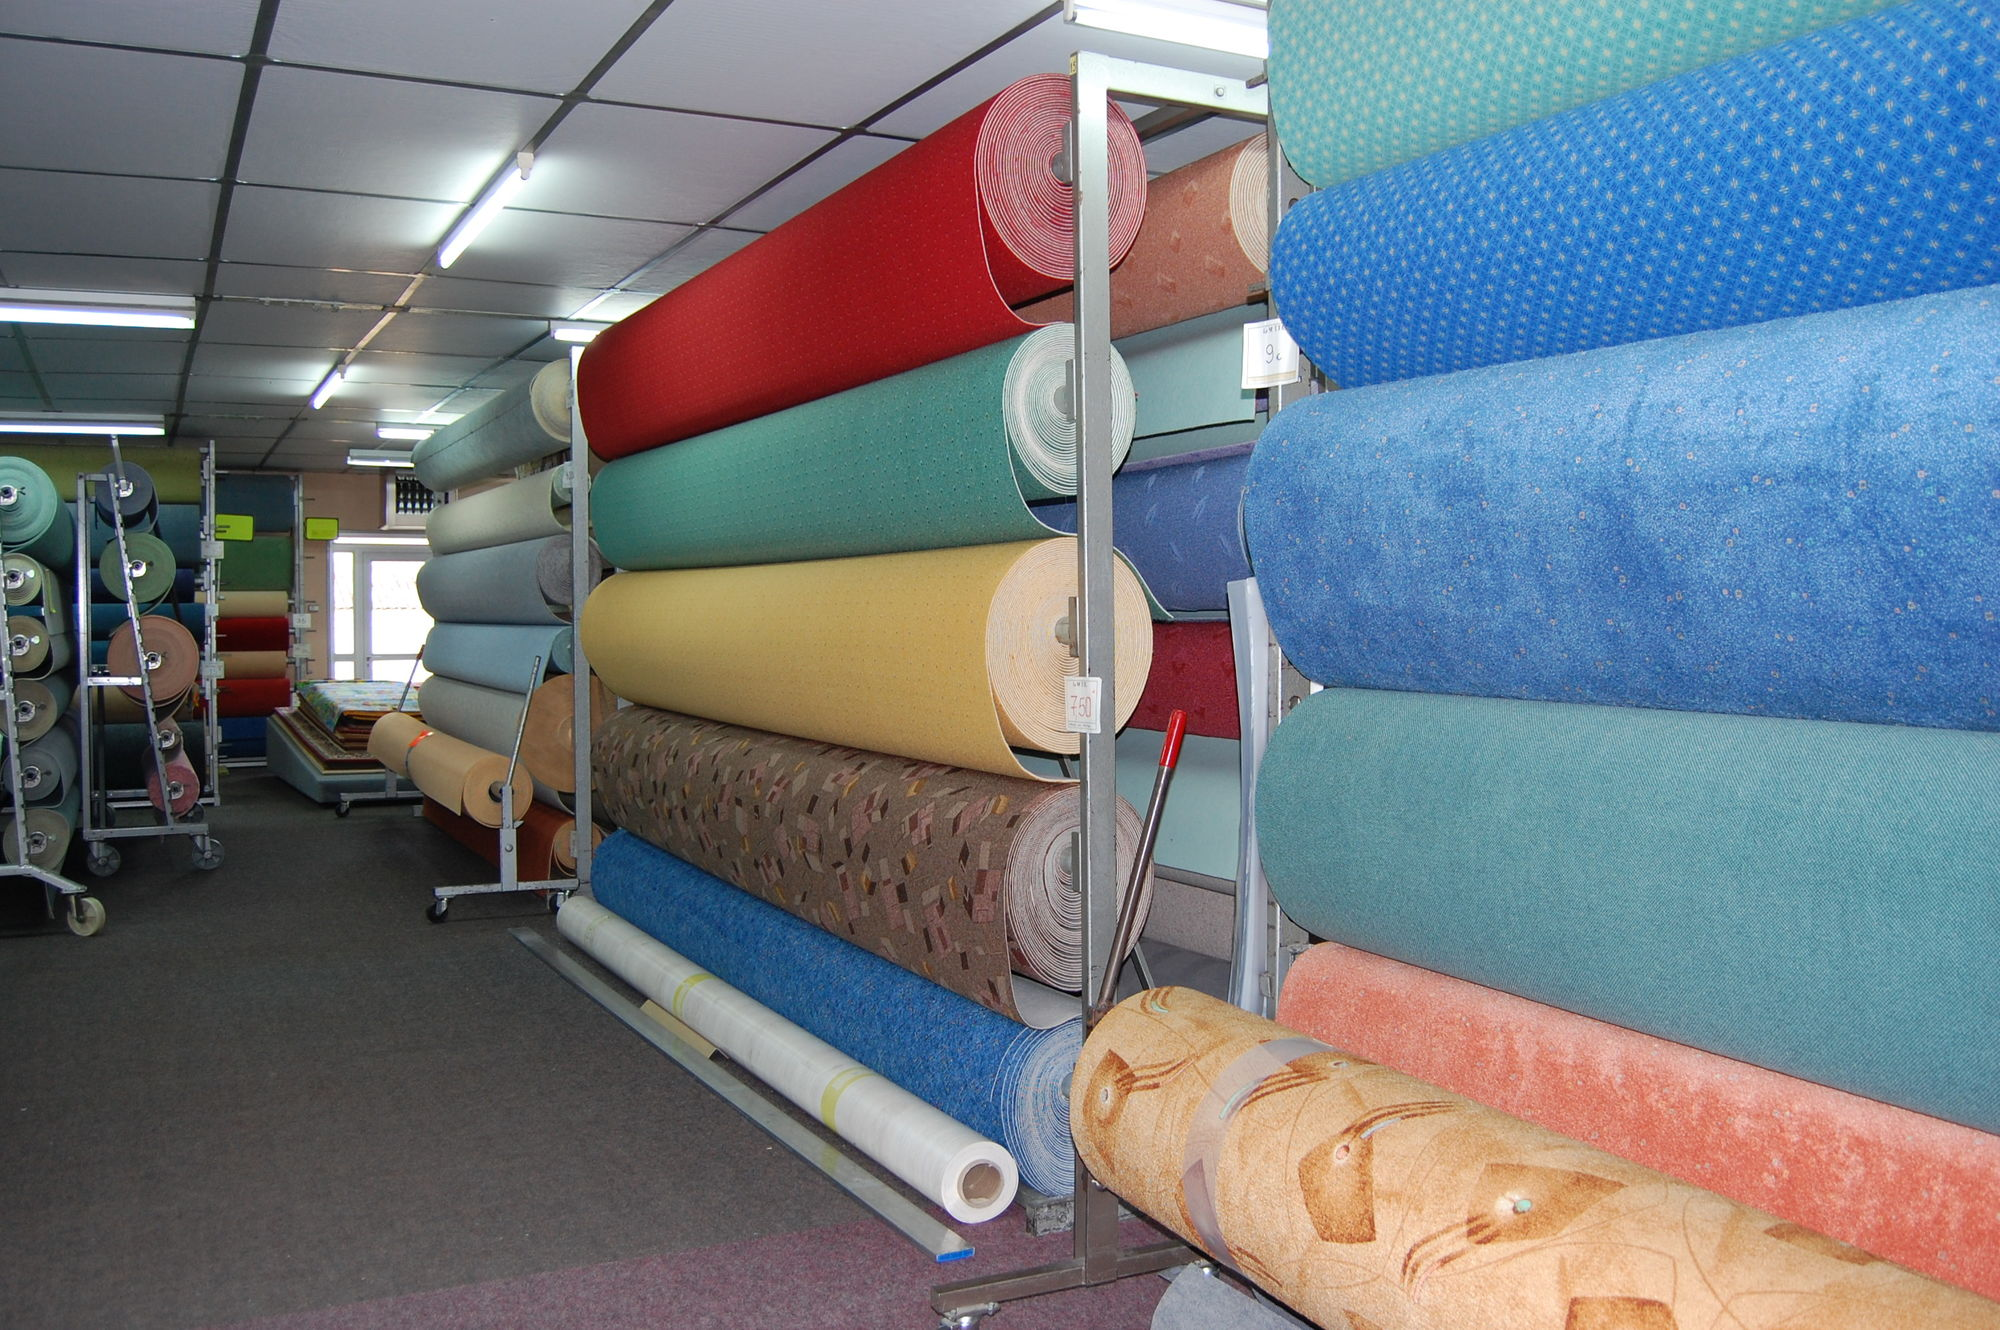 moquette joigny peau tapis store tissus voilage rideau. Black Bedroom Furniture Sets. Home Design Ideas